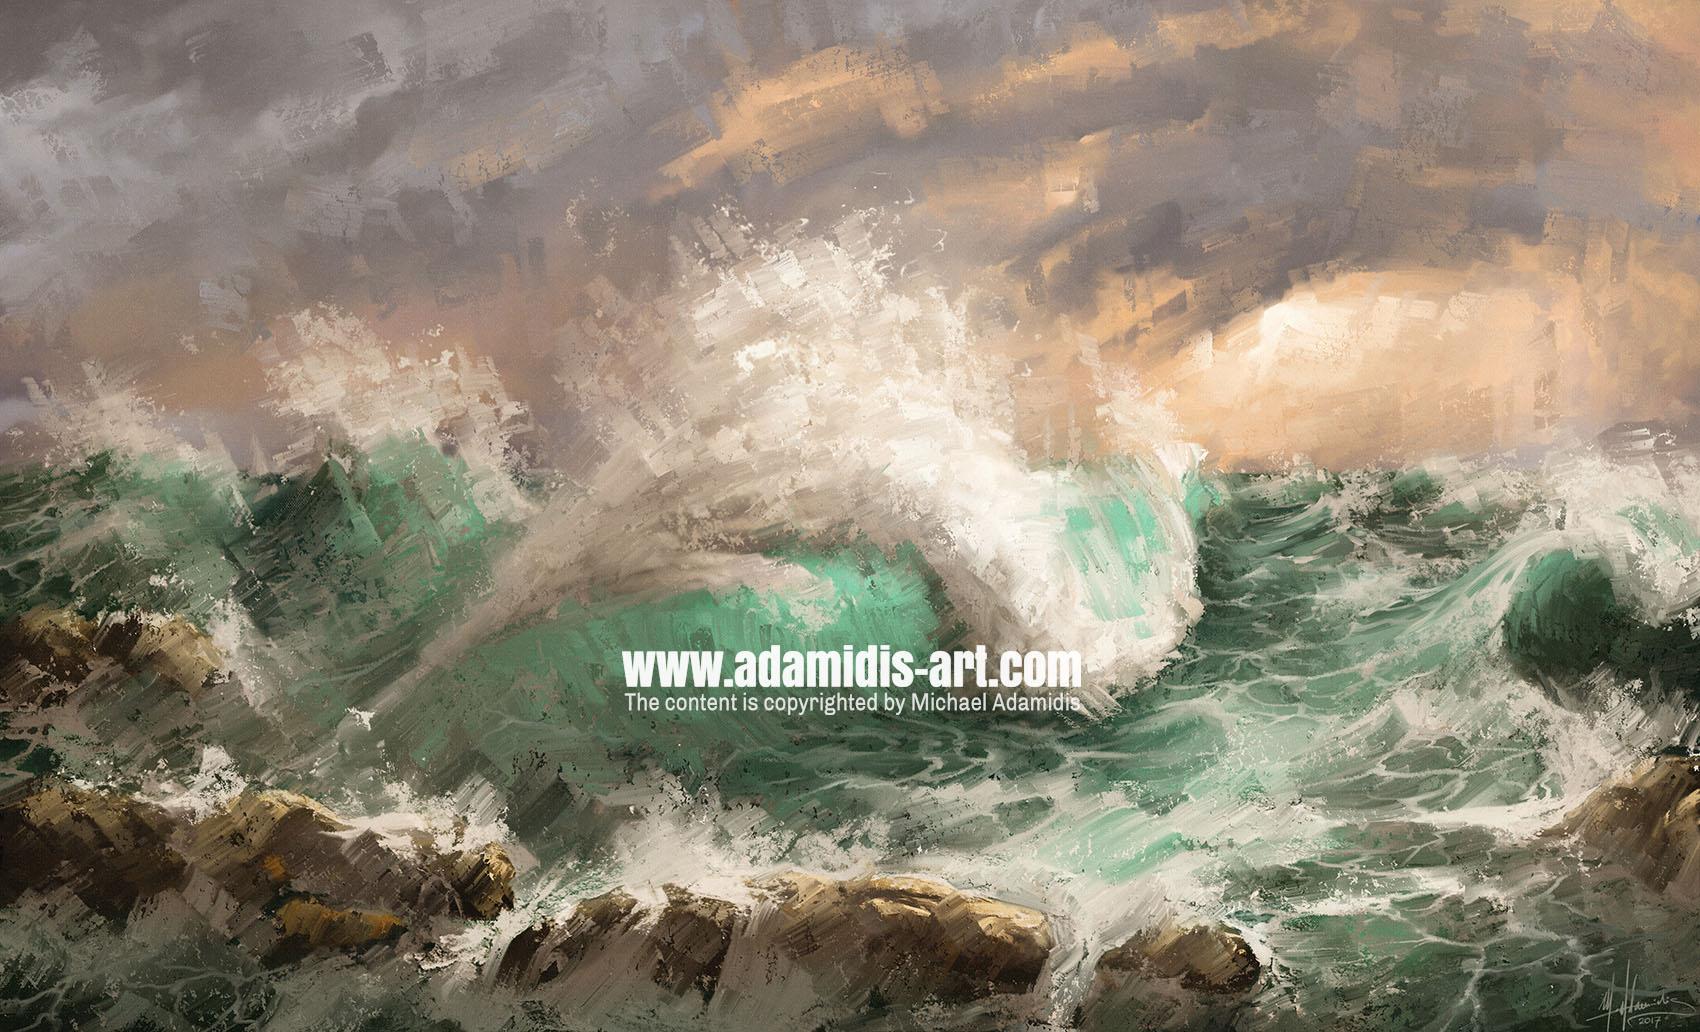 x-Gumroad-Download-Adamidis-Brushes - Michael Adamidis Art